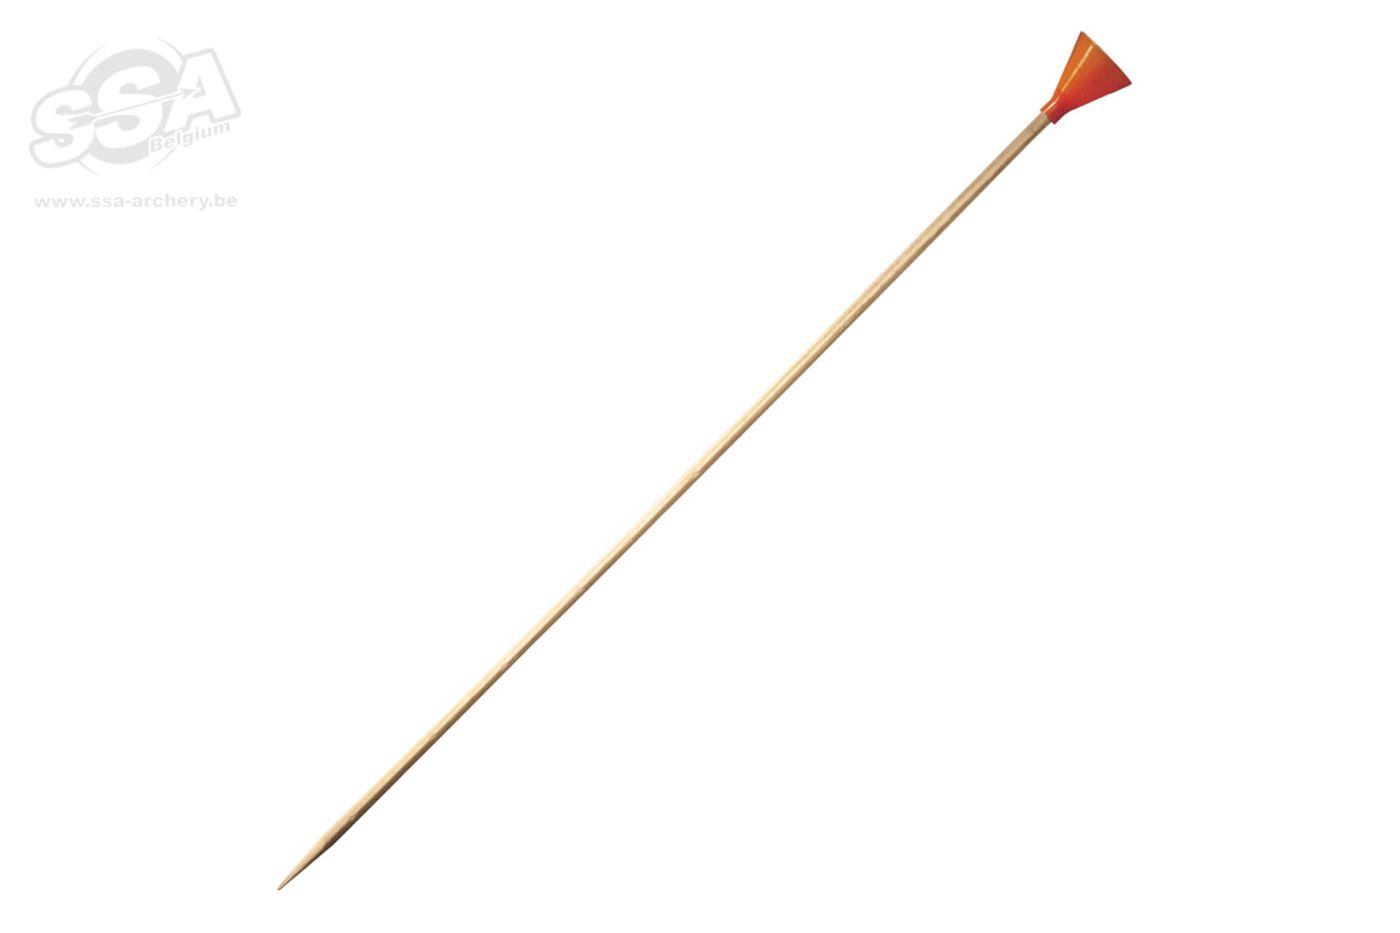 Cold steel dart bamboo